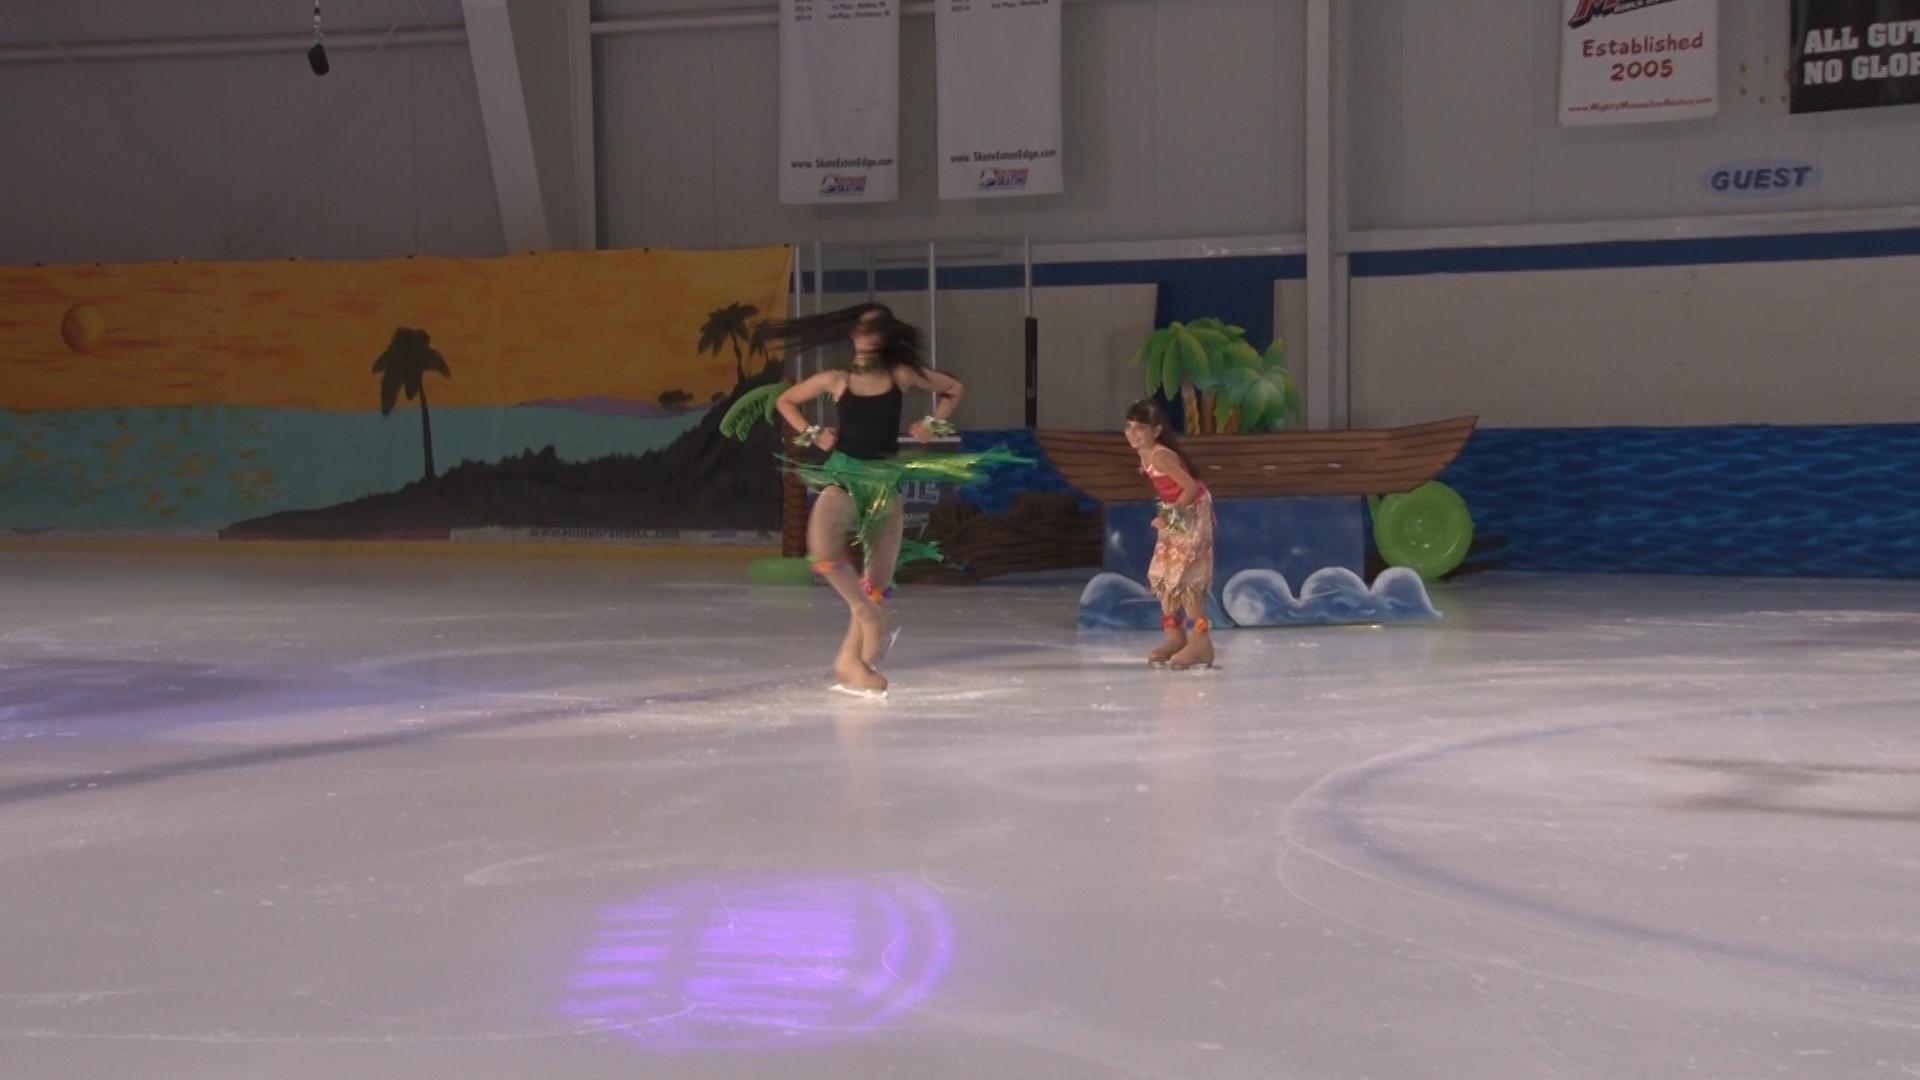 Power Play Maui Skate on Ice 071417.00_08_50_14.Still014.jpg